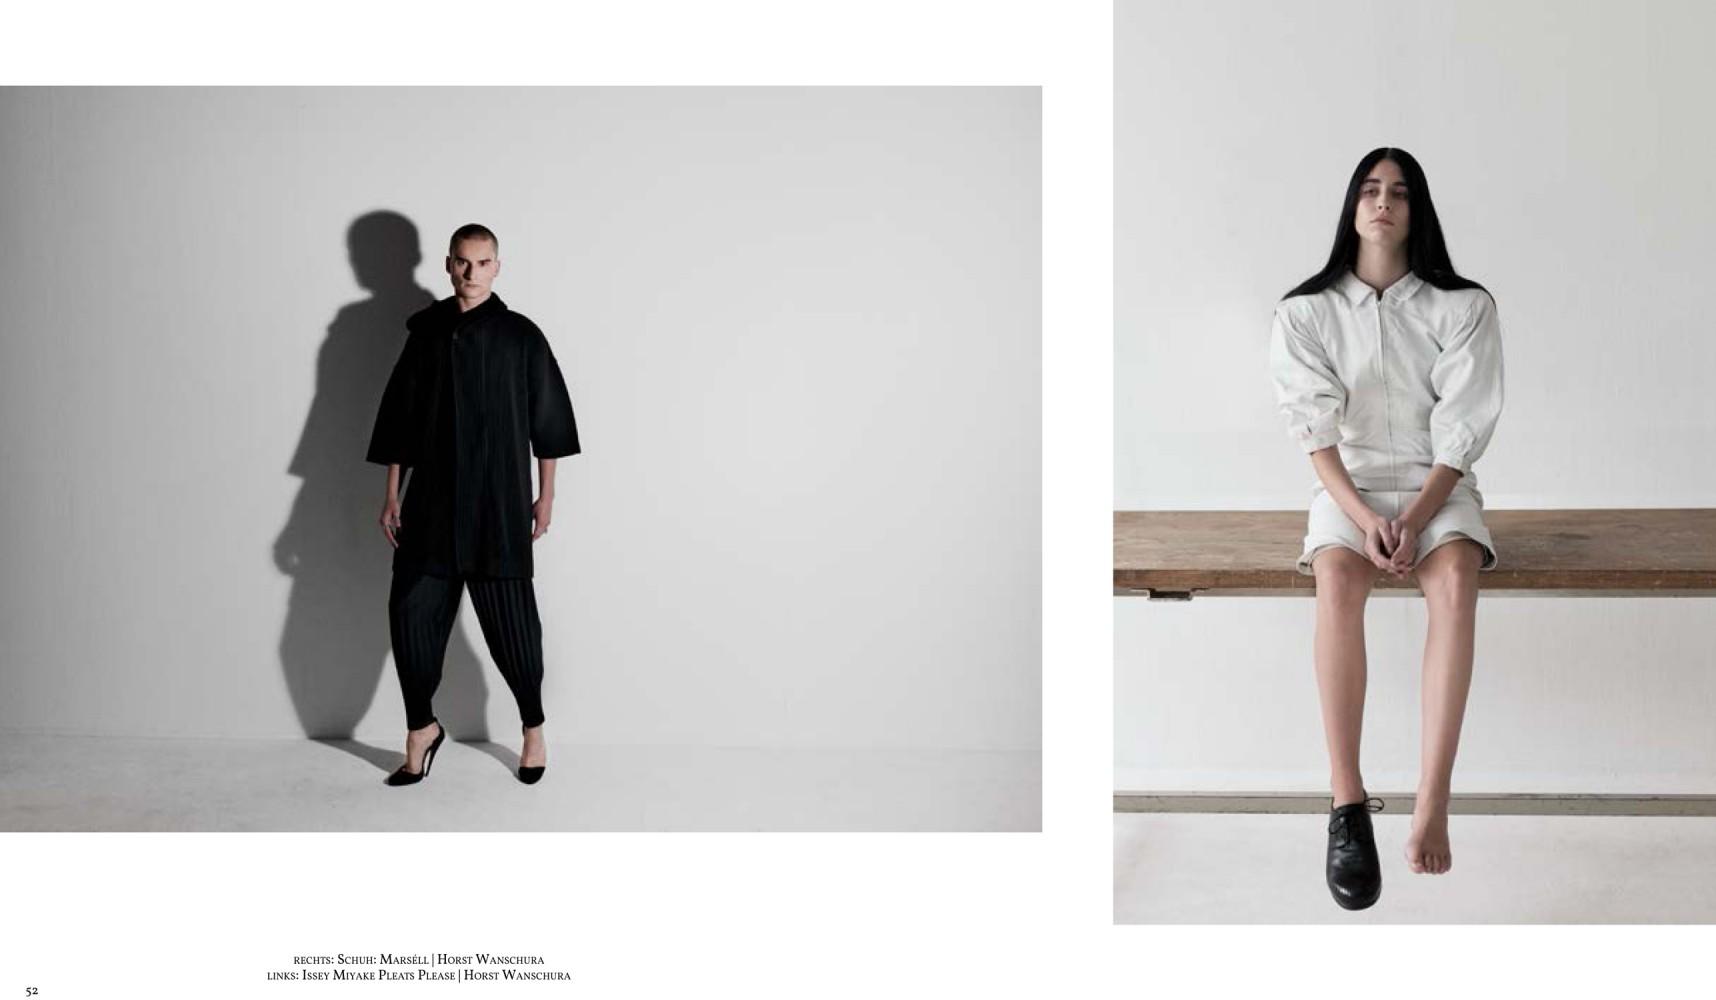 Monica-Menez-Fotostrecke-Magazin-3